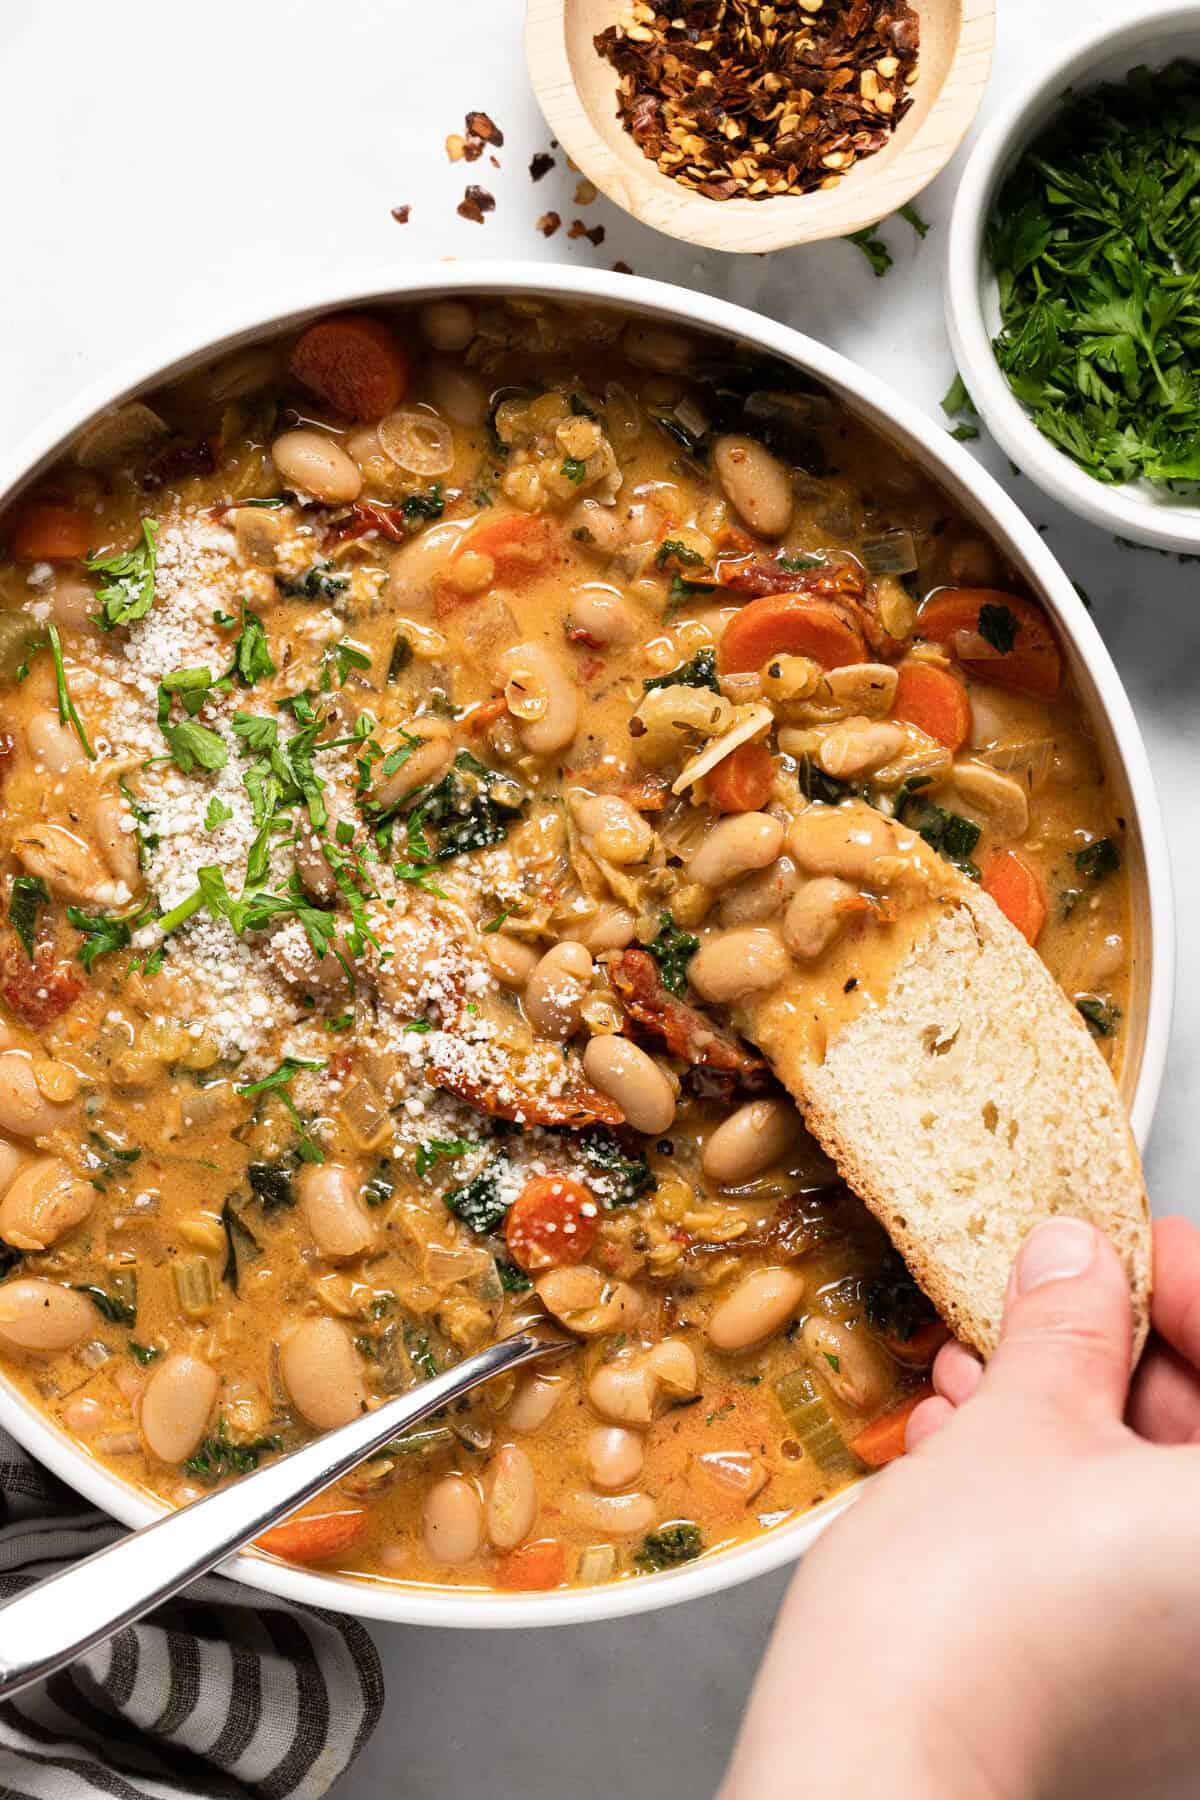 Large white bowl filled with creamy vegan white bean stew